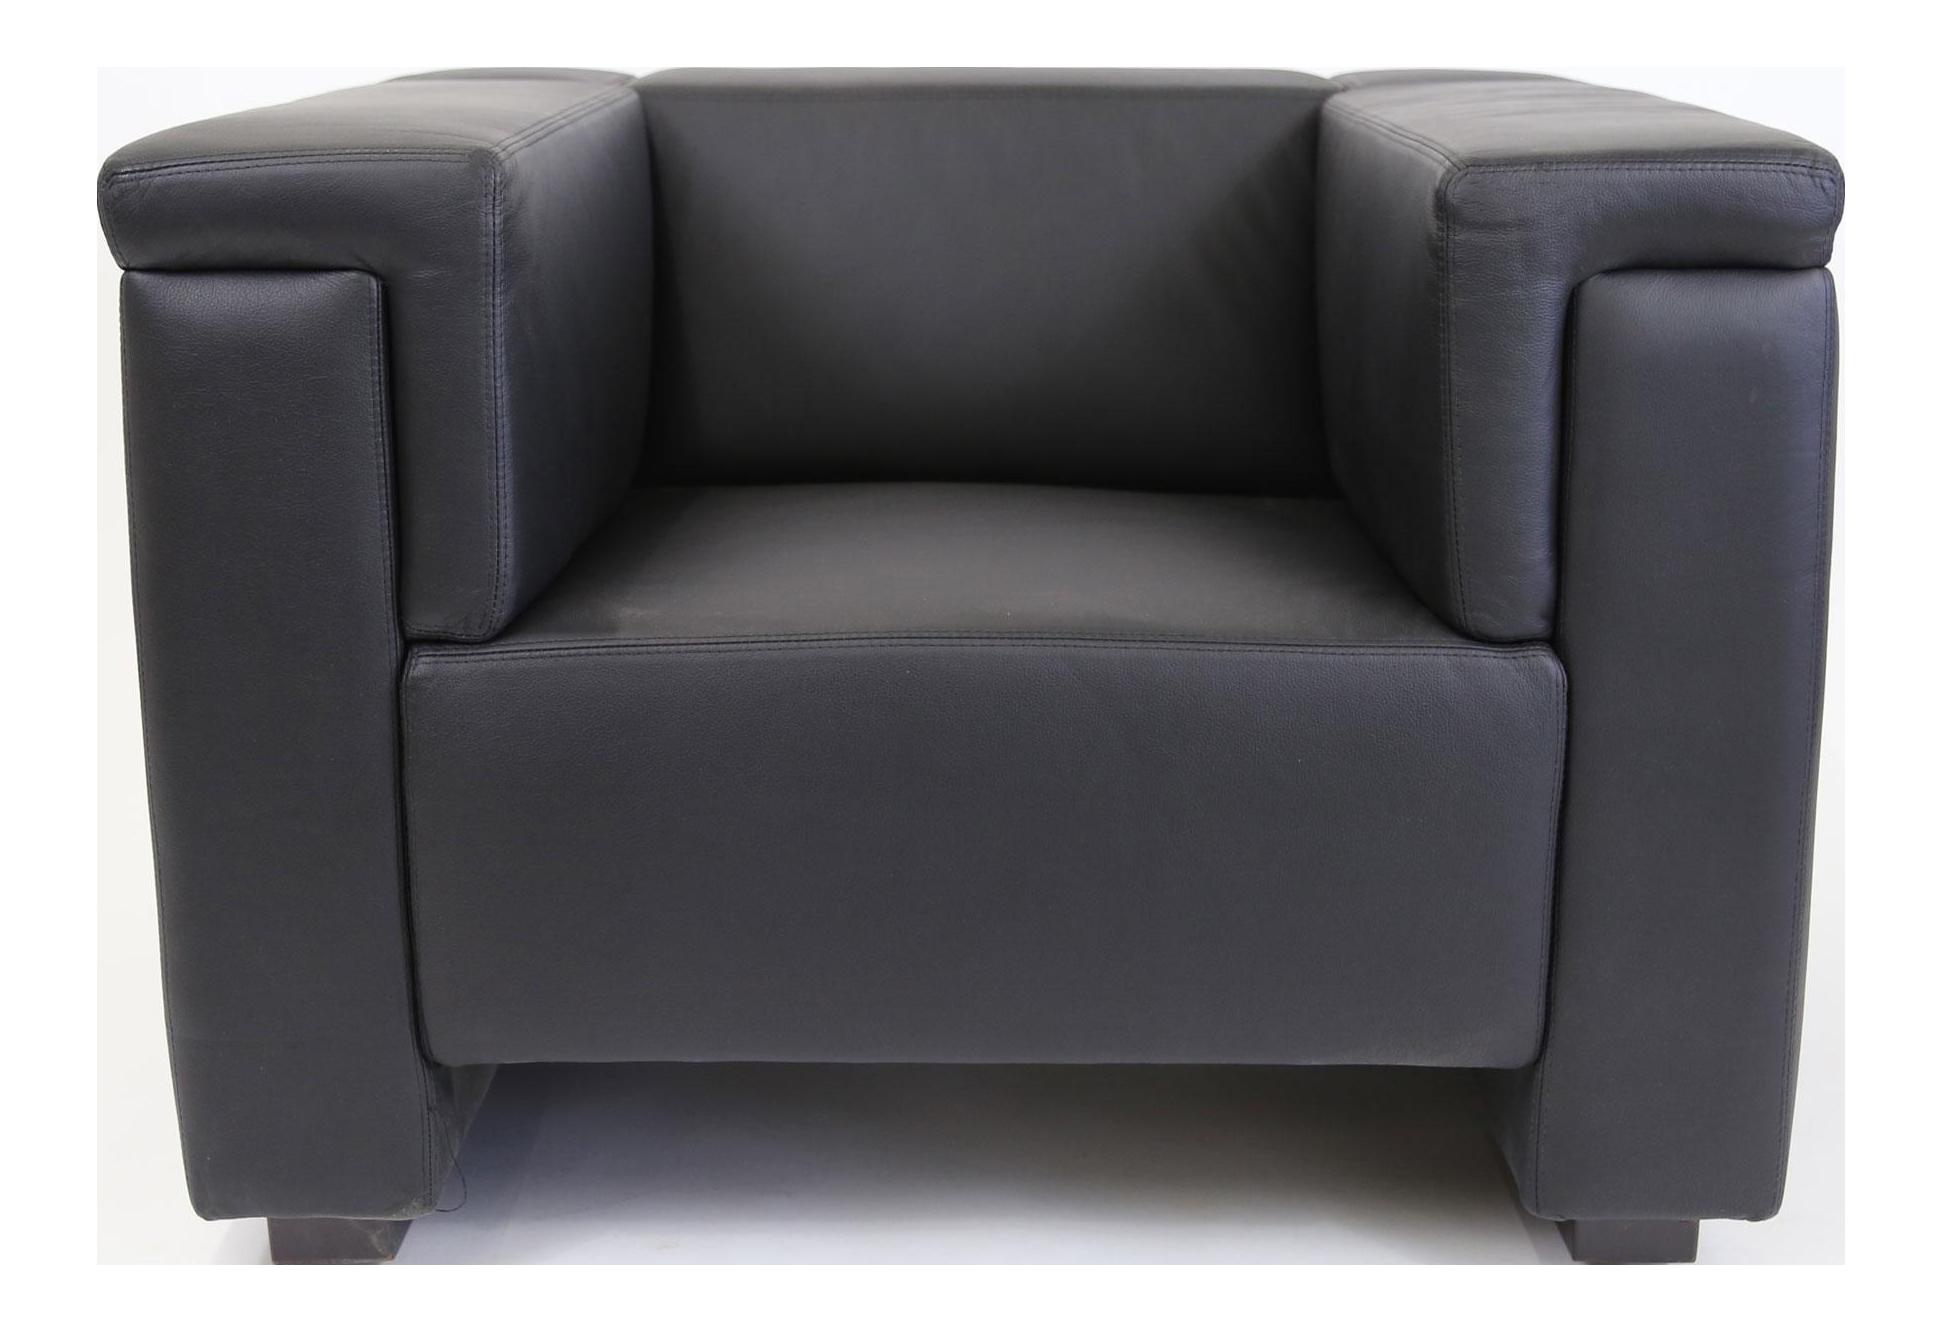 brazilian modern mannes black leather club chair - Leather Club Chairs